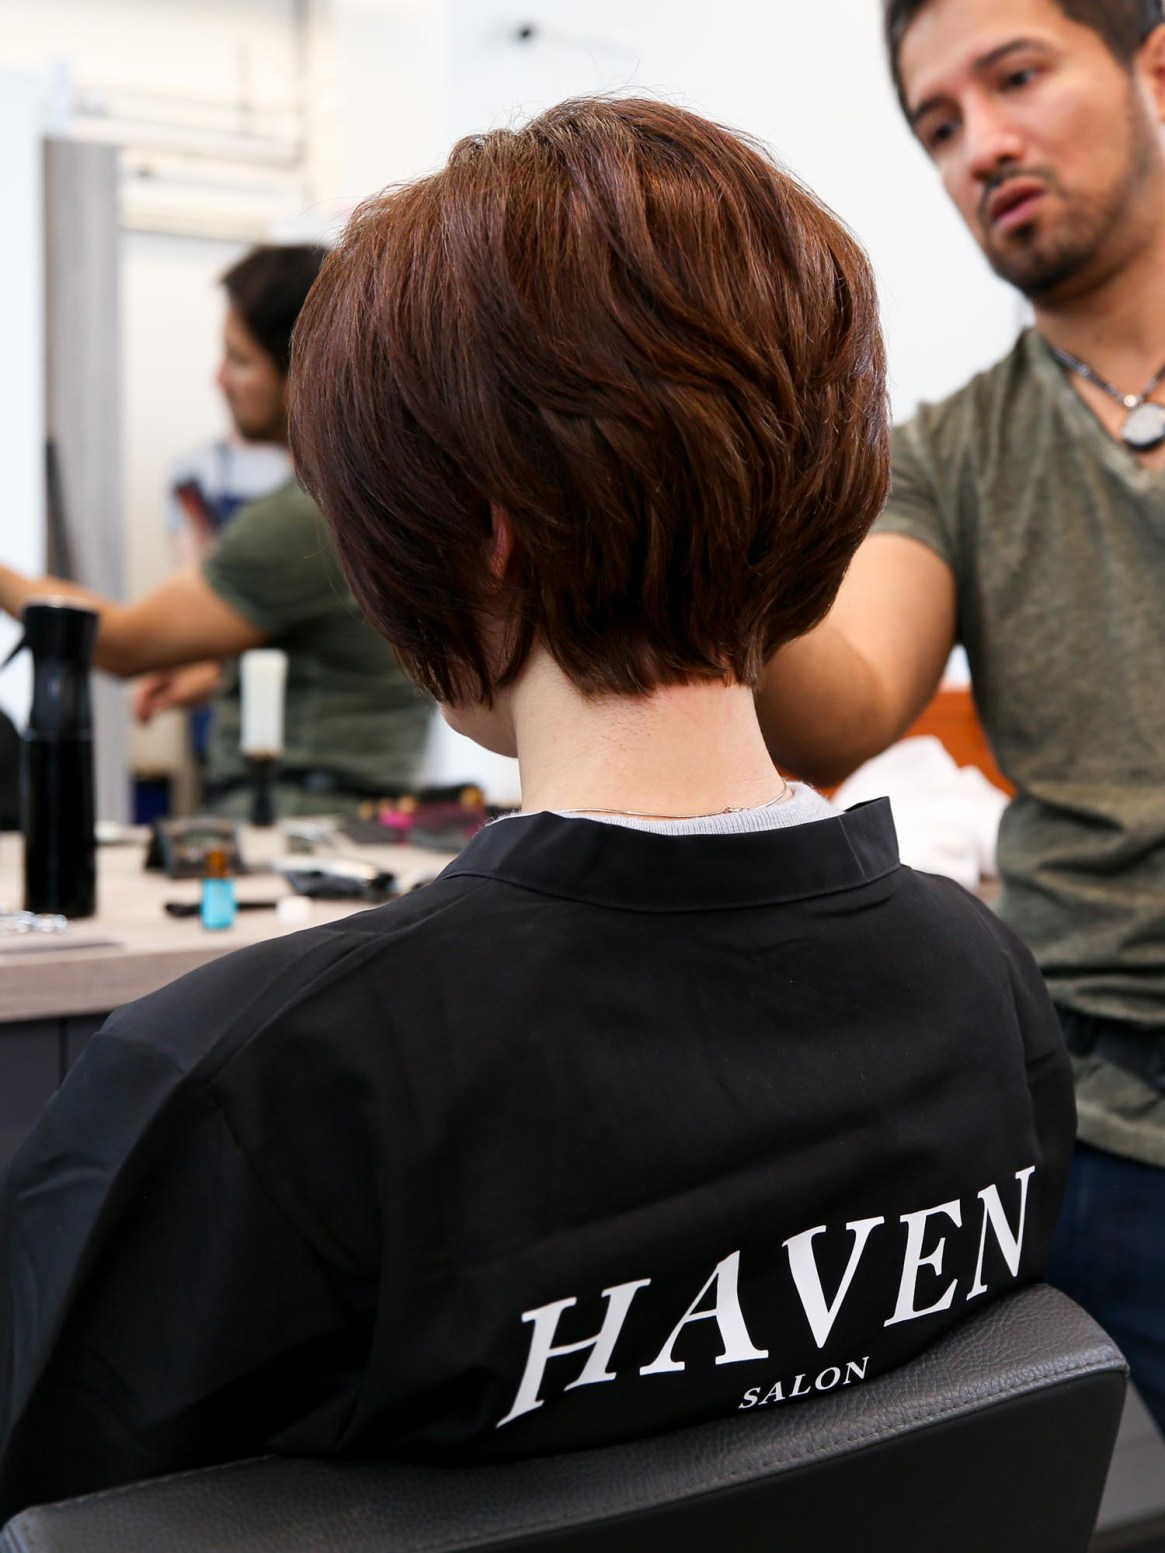 Haven Salon hair cutting services.